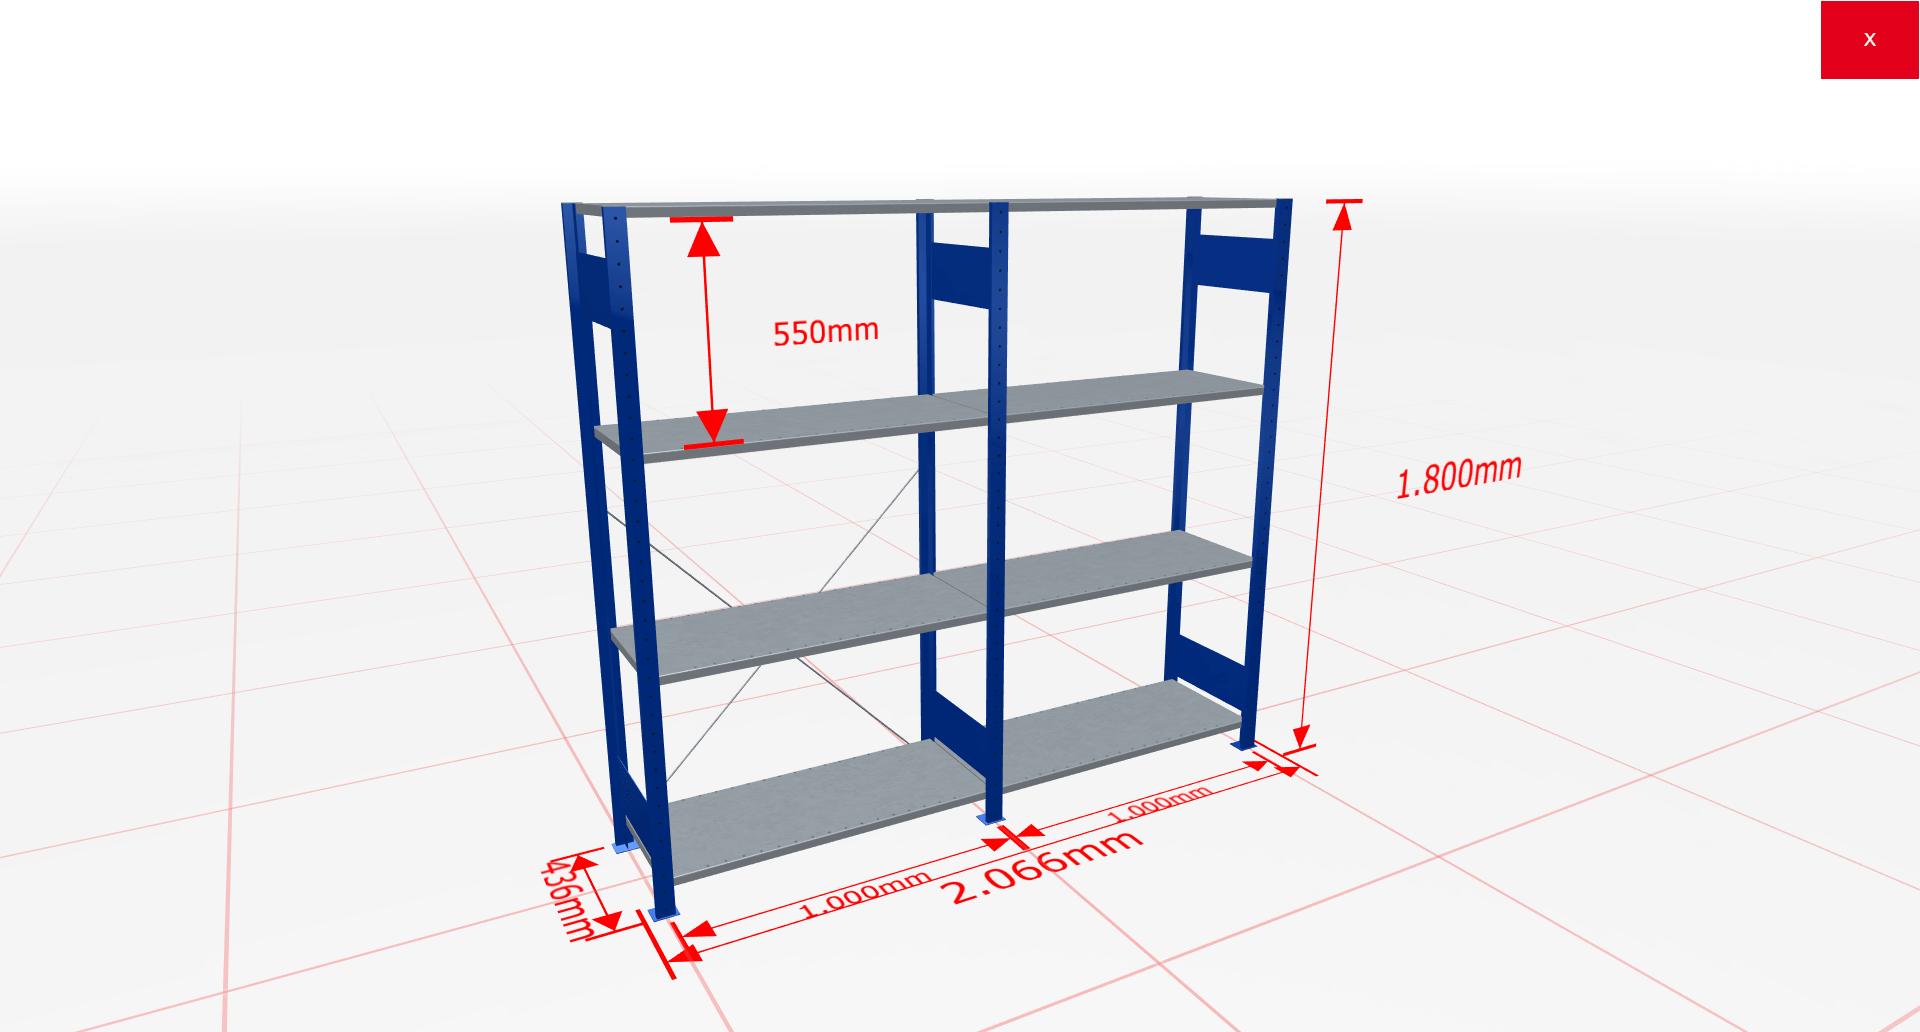 Fachbodenregal Komplettregal 1800x2066x400 mm (HxBxT) SCHULTE Lagertechnik blau 4 Ebenen  150 kg je Boden